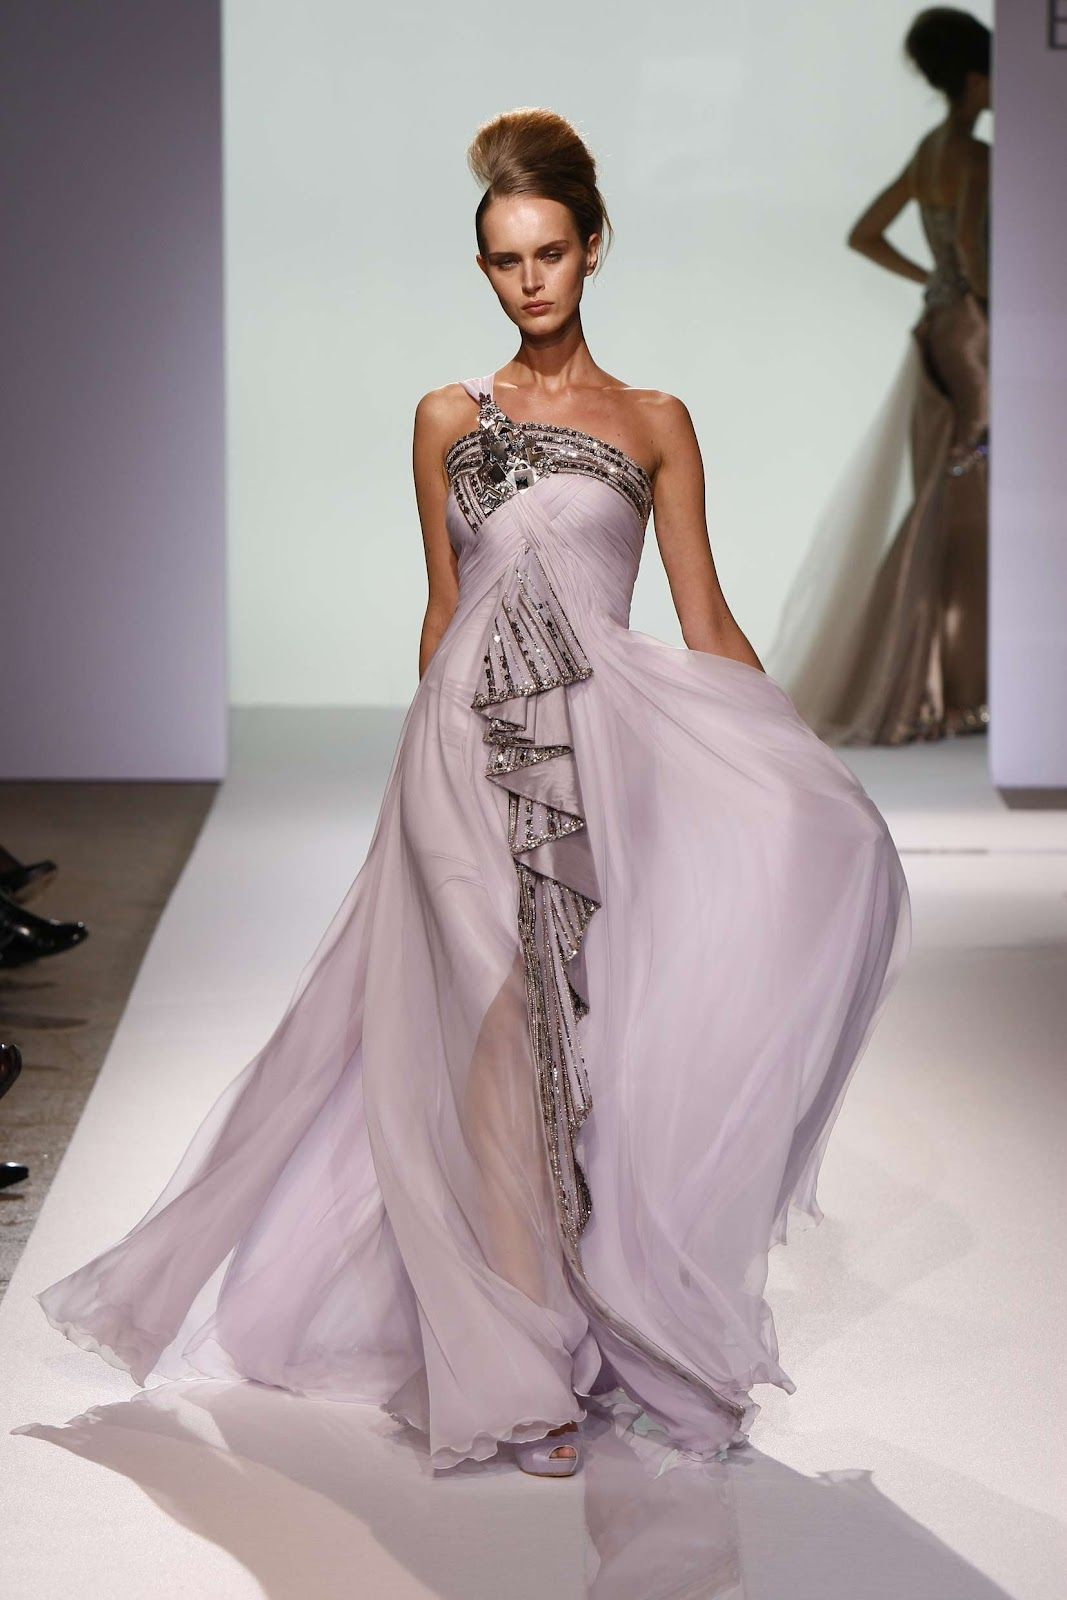 Basil+Soda+prom+dresses++Basil+Soda+evening+gowns+(1).jpg (1067×1600)